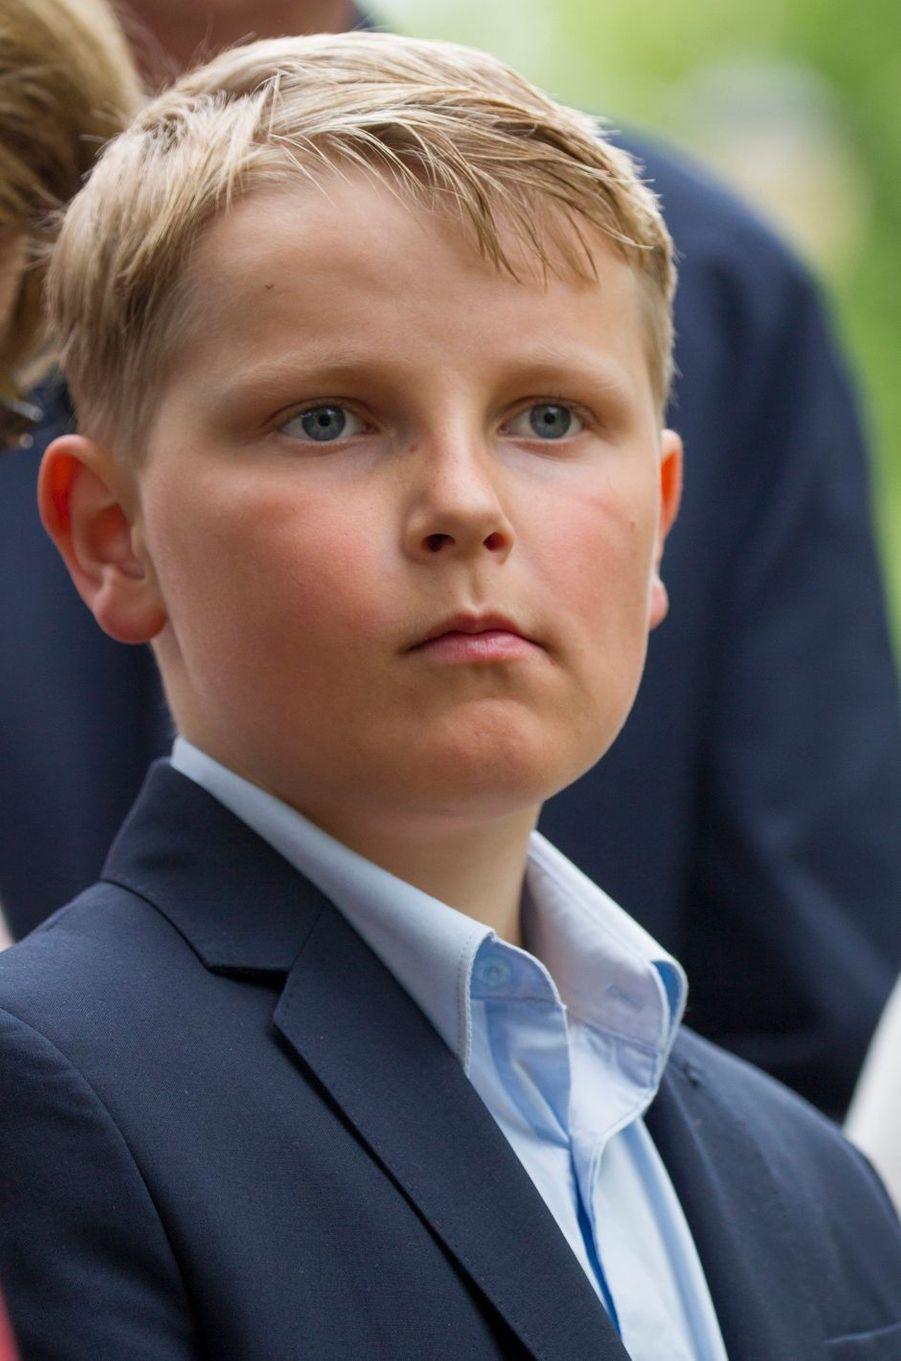 Le prince Sverre Magnus de Norvège à Oslo, le 19 mai 2016